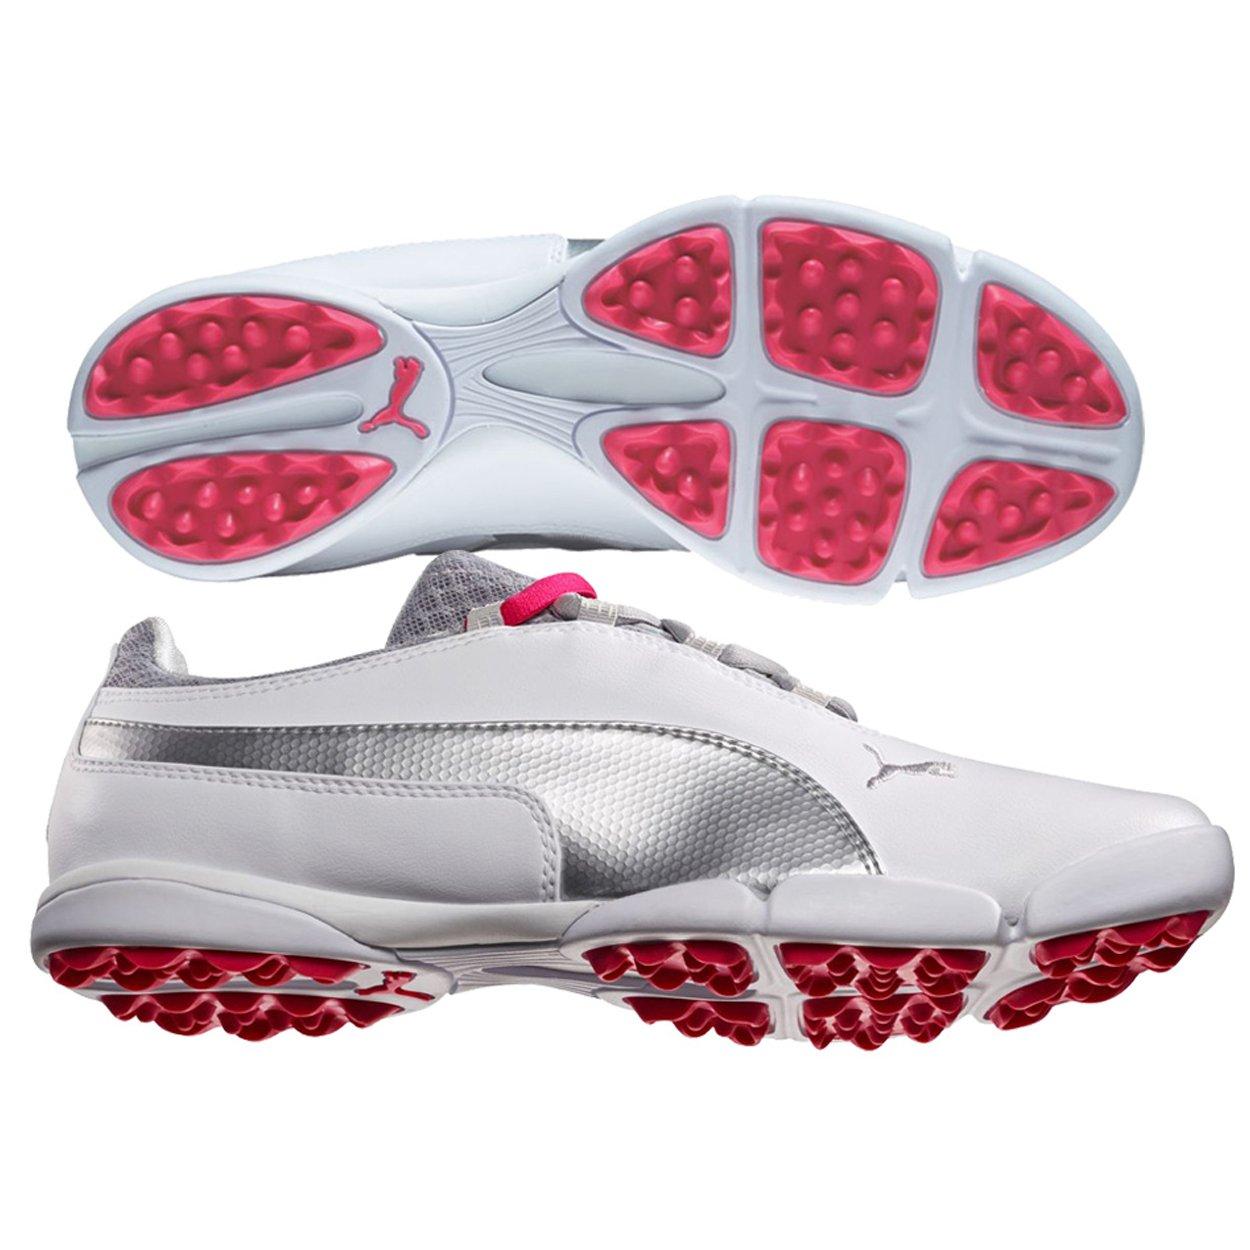 PUMA Women's Sunnylite Golf Shoe Spikeless, White Silver/Raspberry, 9.5 M US